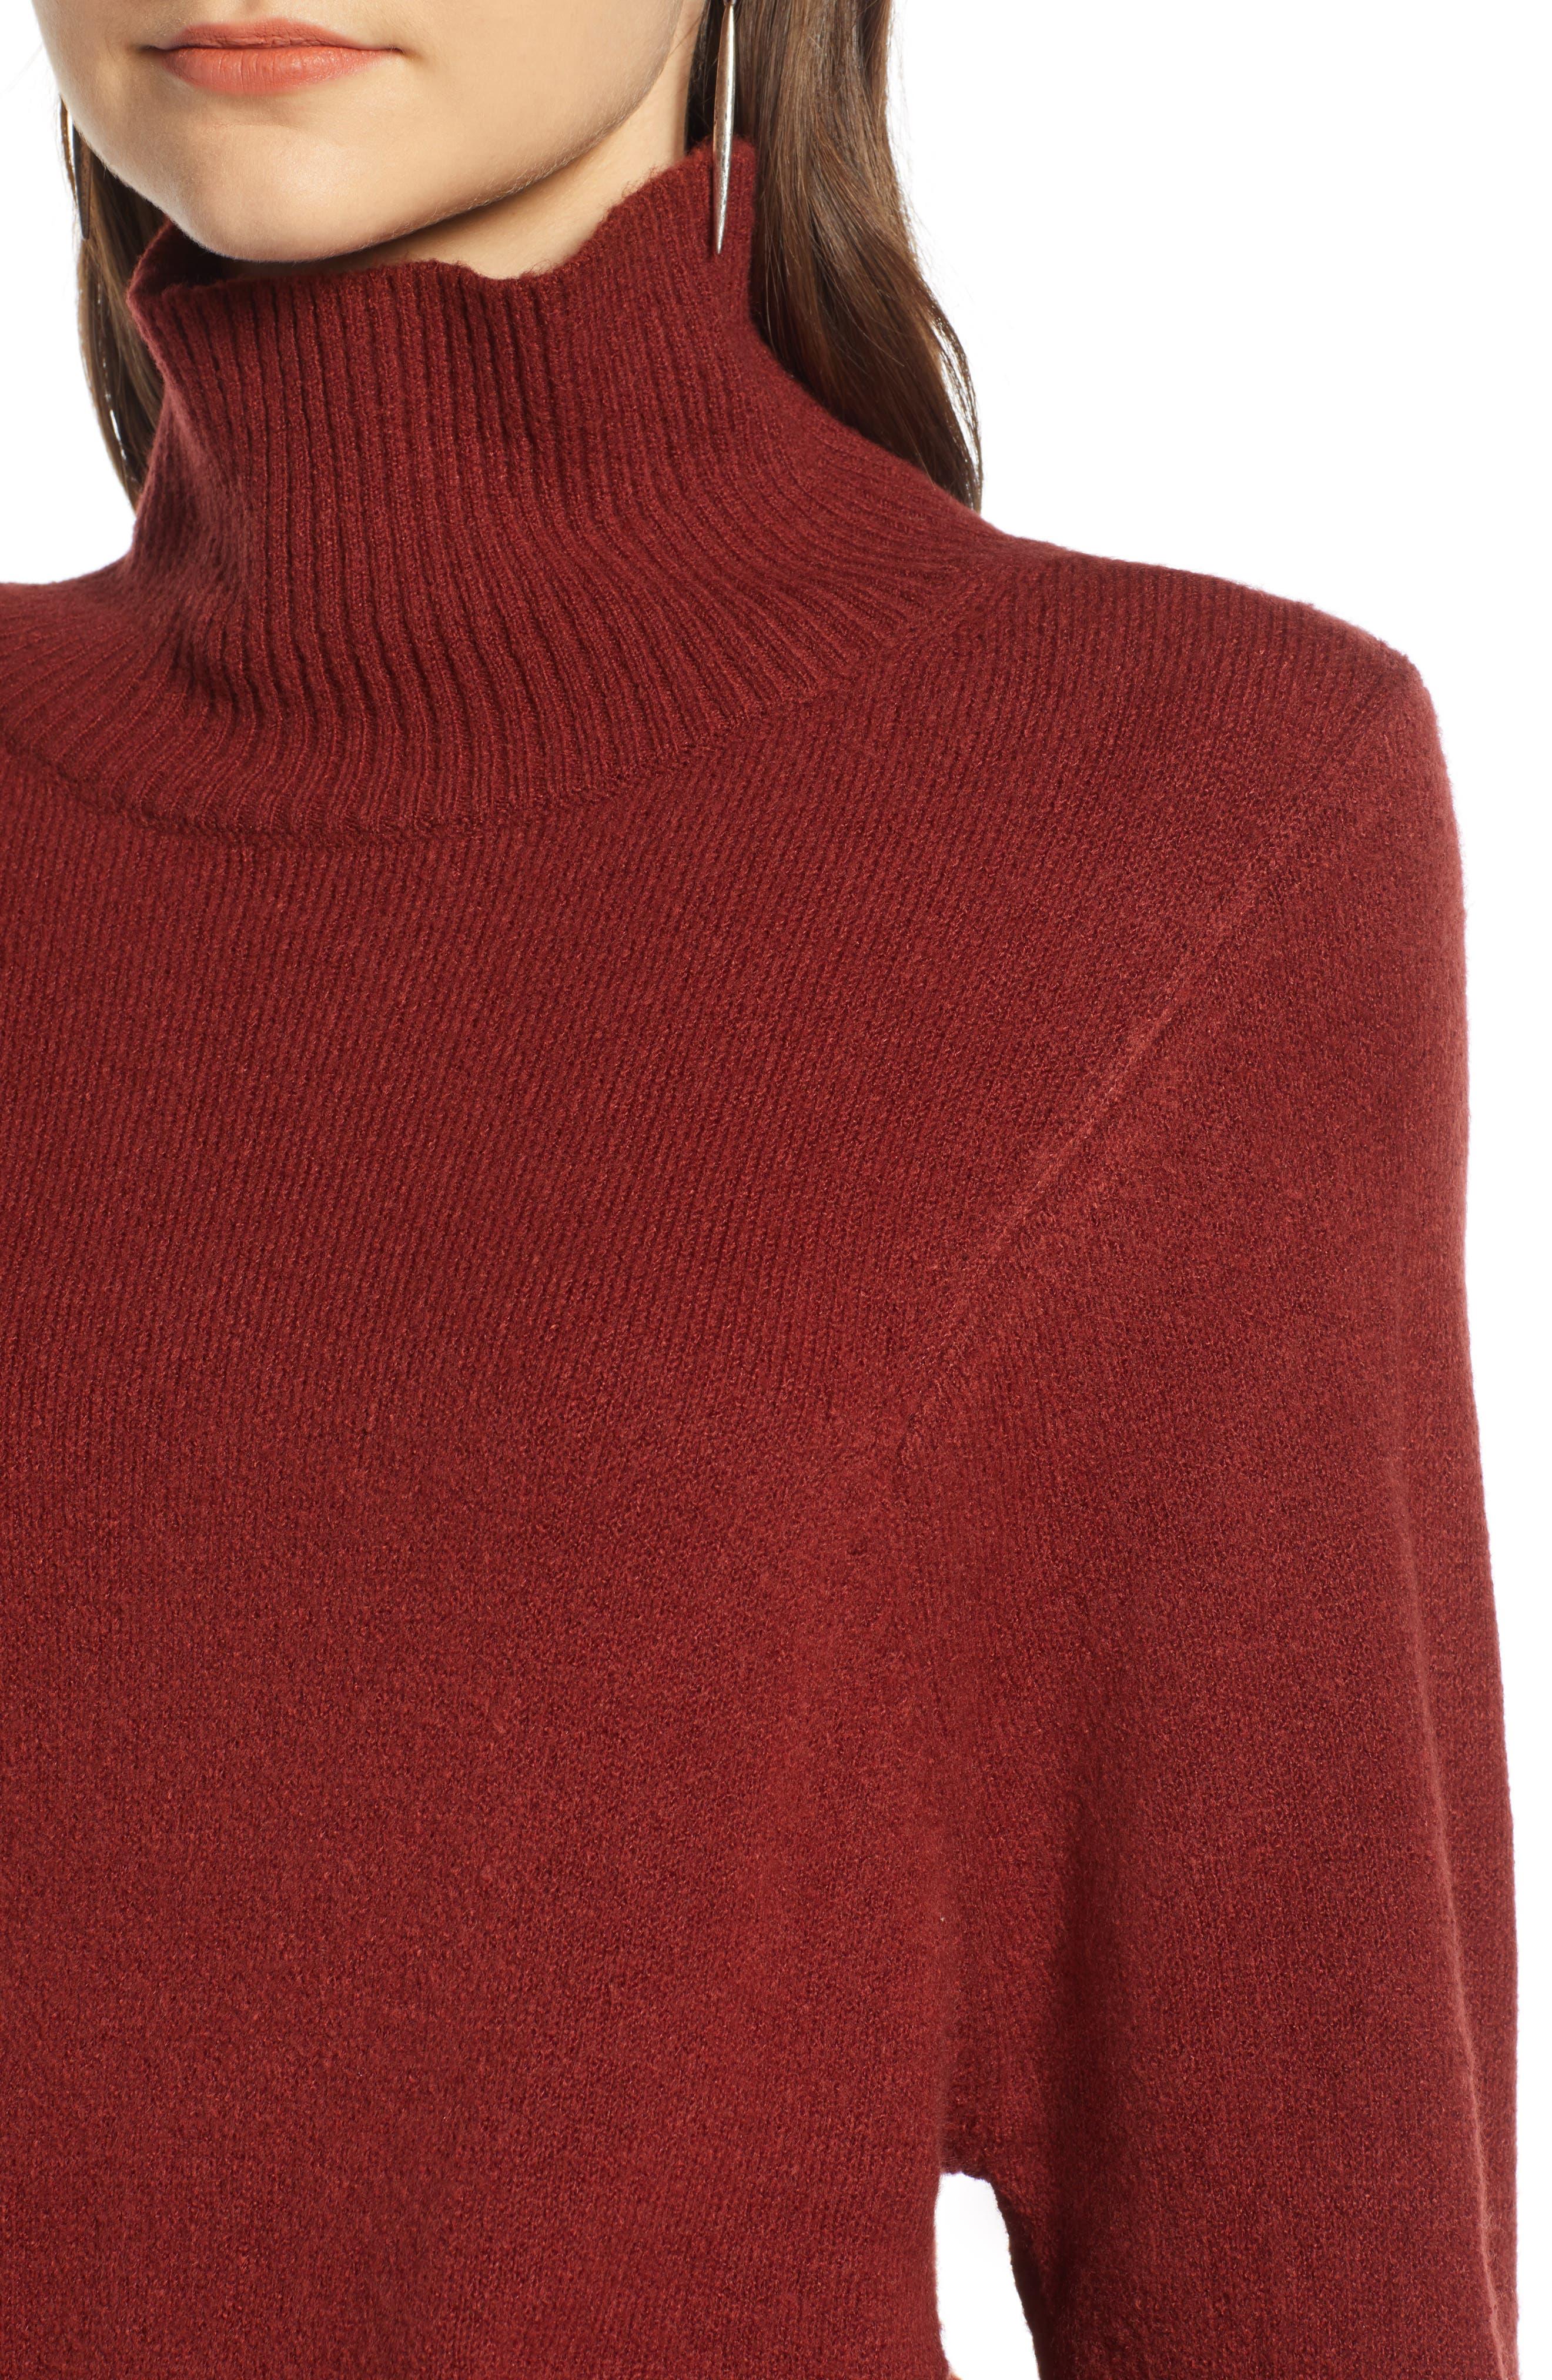 Seasonal Pullover Sweater,                             Alternate thumbnail 4, color,                             BURGUNDY RUSSET